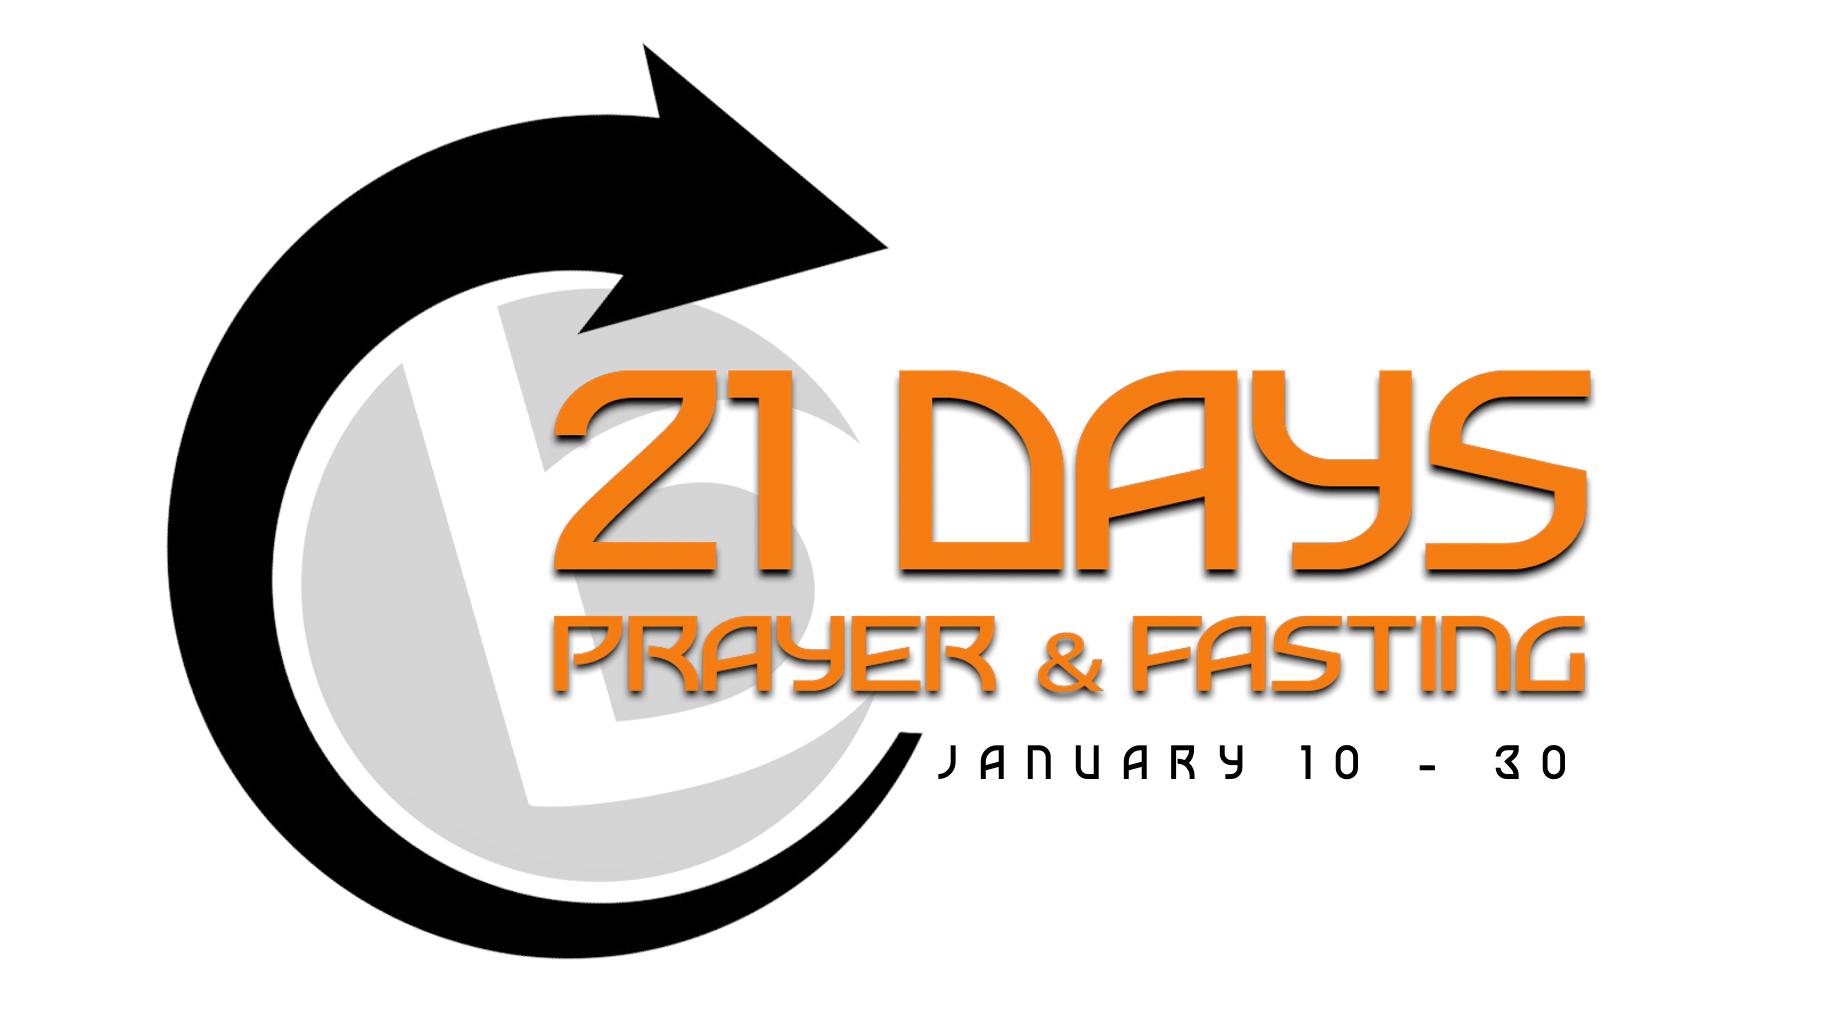 21 Days of Prayer & Fasting